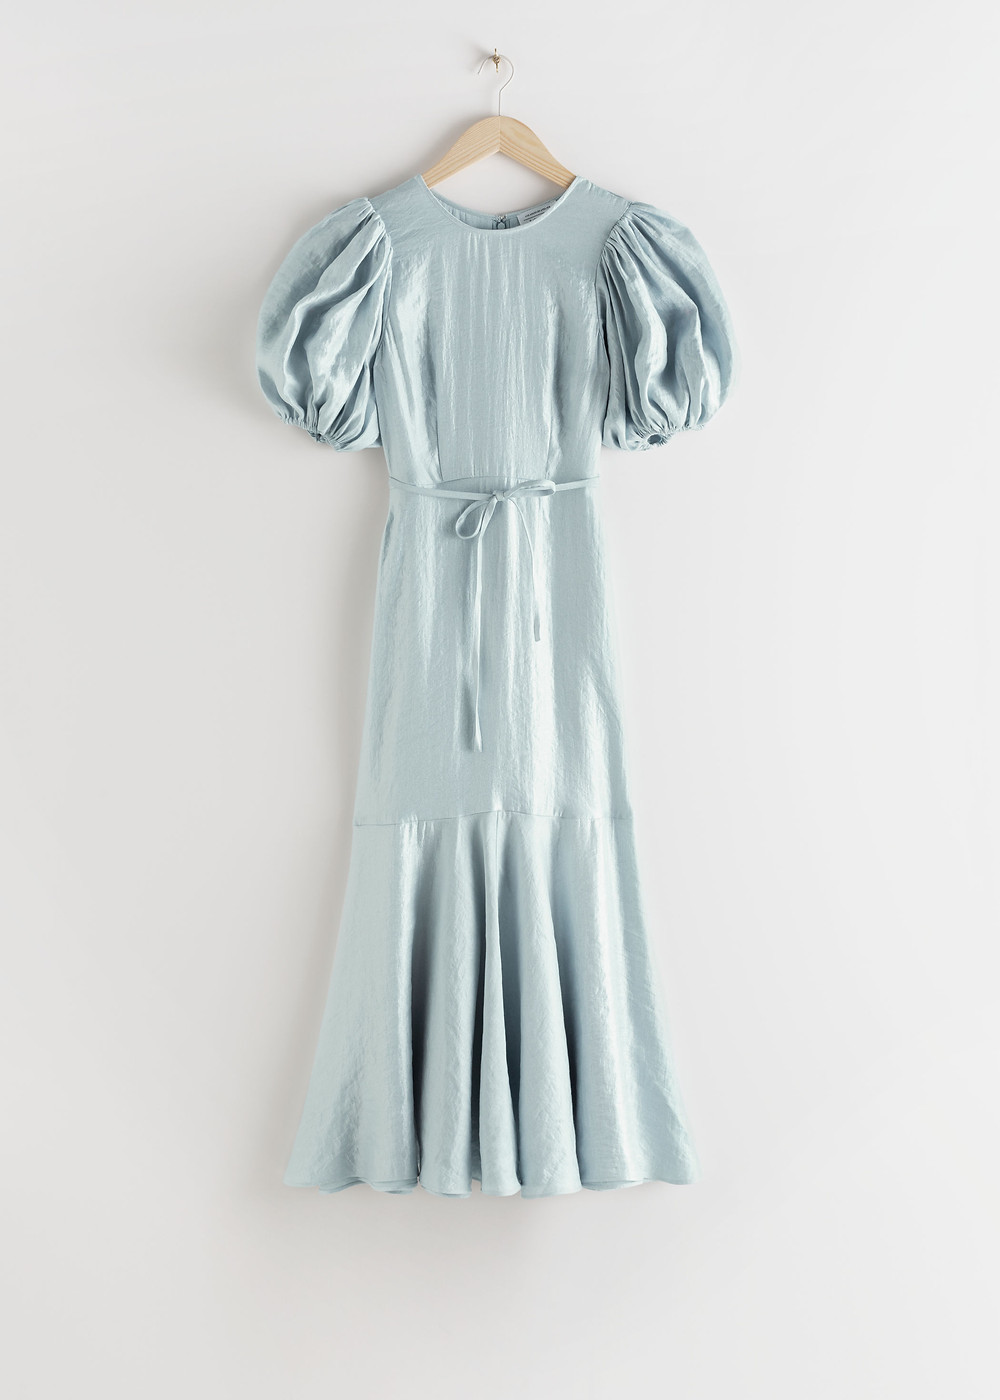 Metallic blue crepe dress